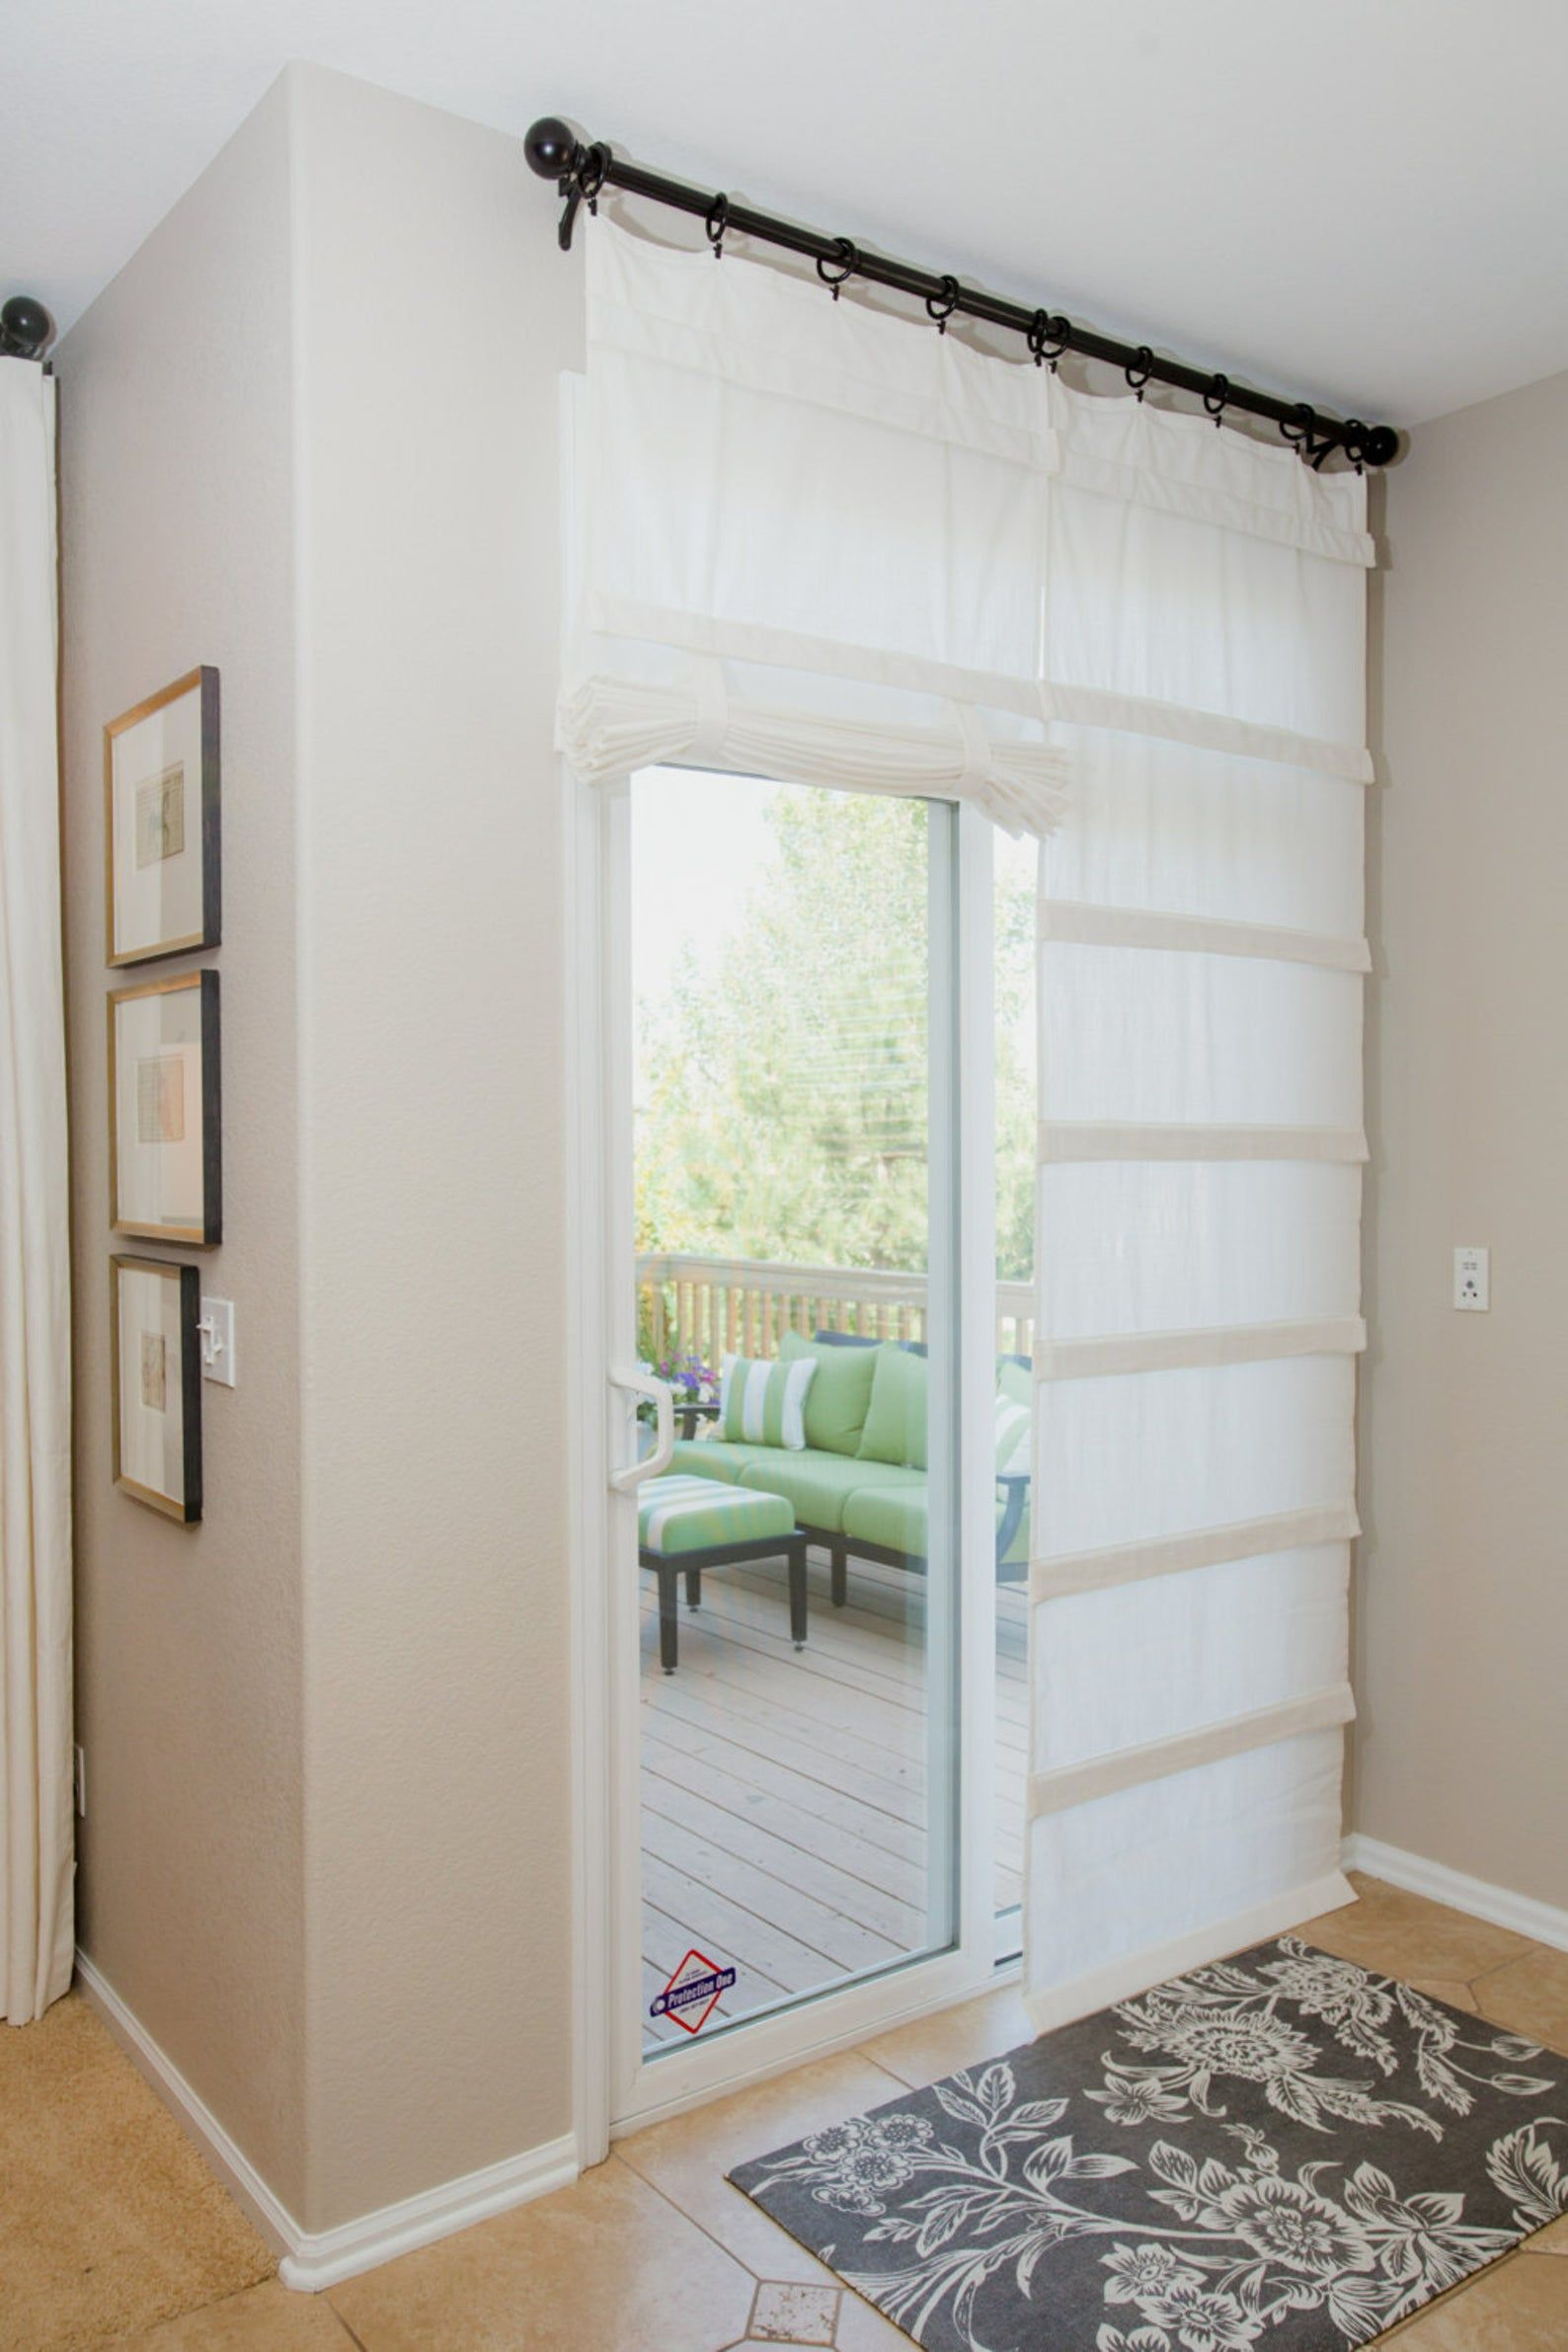 Off White Sliding Glass Door Curtain Shade Pricing Is For 1 Panel In 2020 Sliding Glass Door Curtains Glass Door Curtains Sliding Glass Door